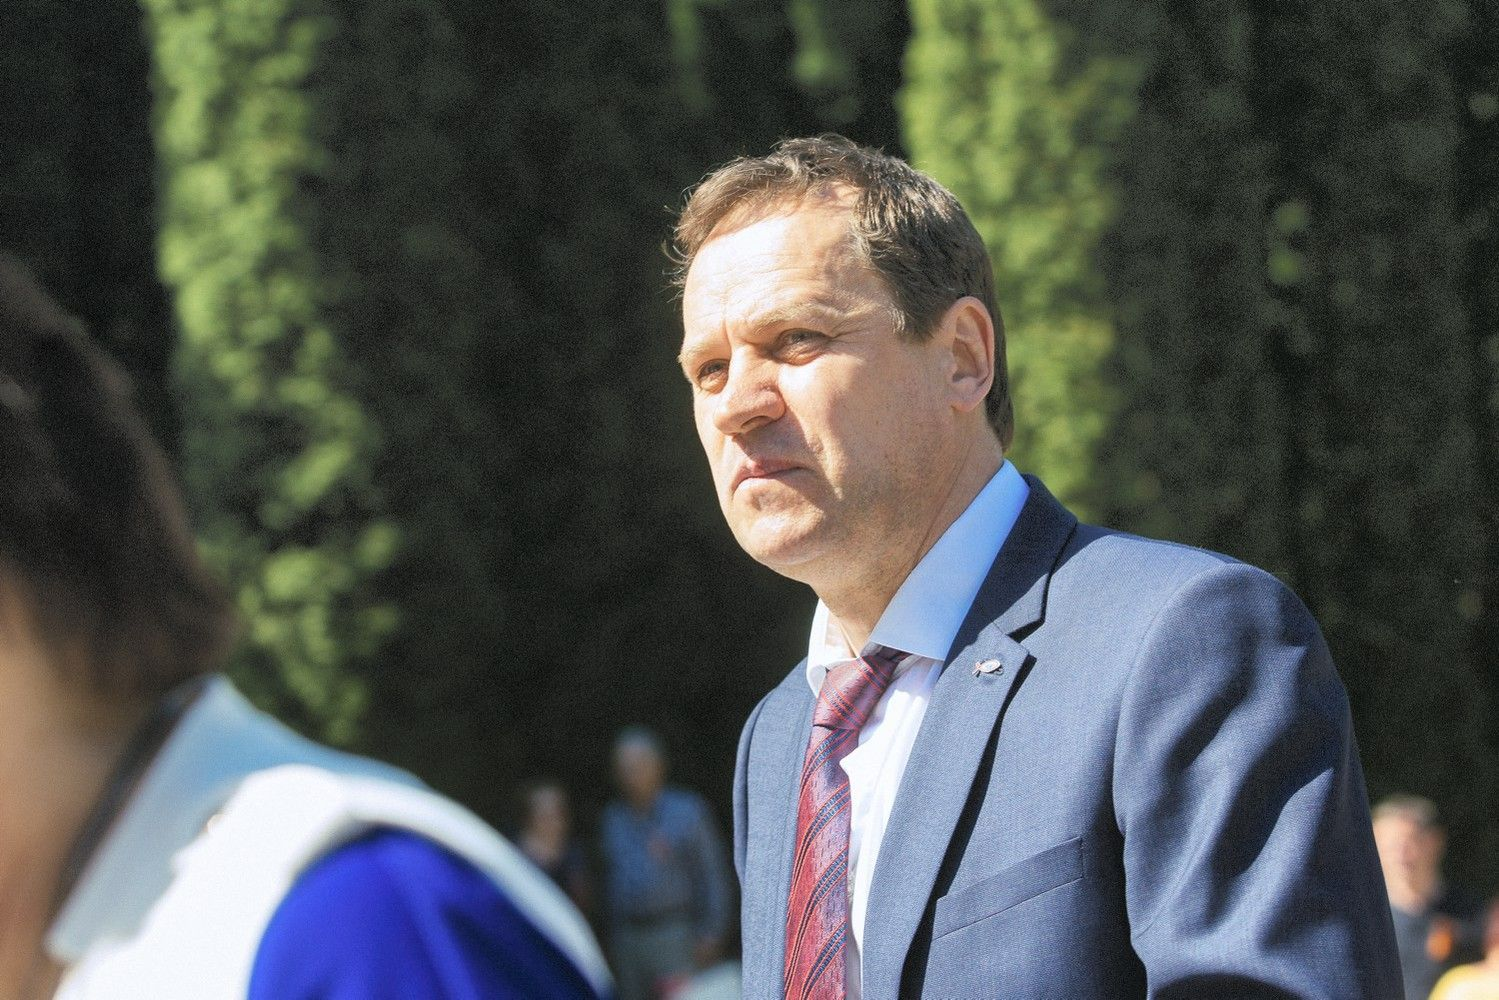 Dėl prezidento posto ketina varžytis ir V.Tomaševskis